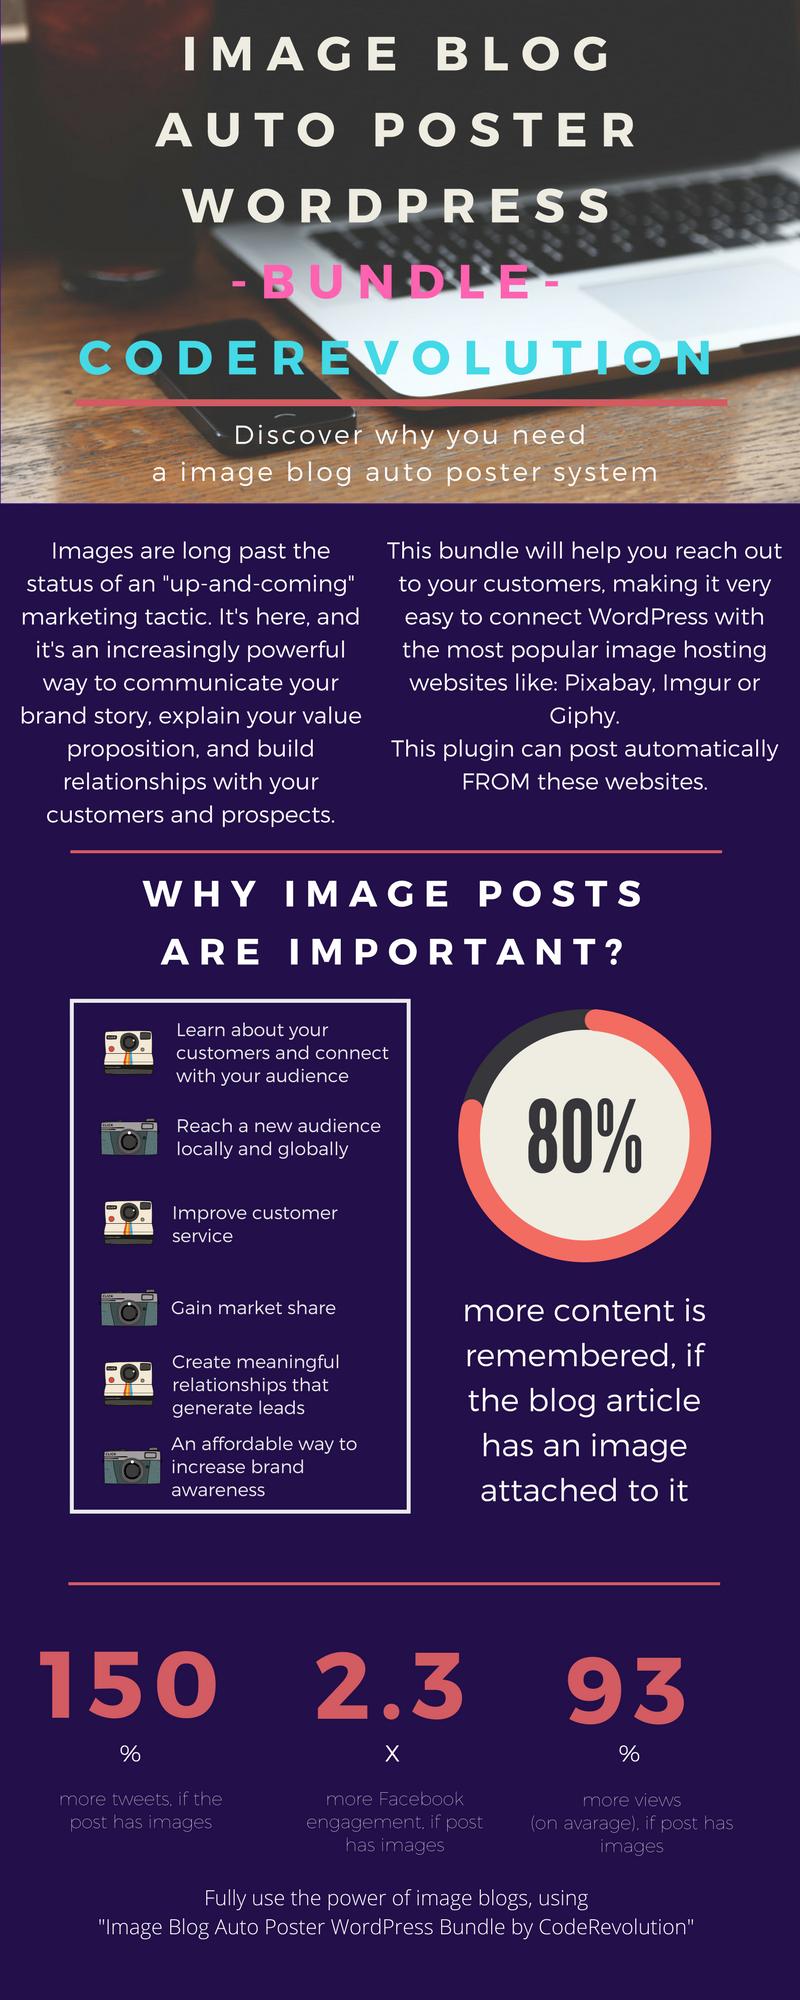 Image Blog Auto Poster WordPress Bundle by CodeRevolution